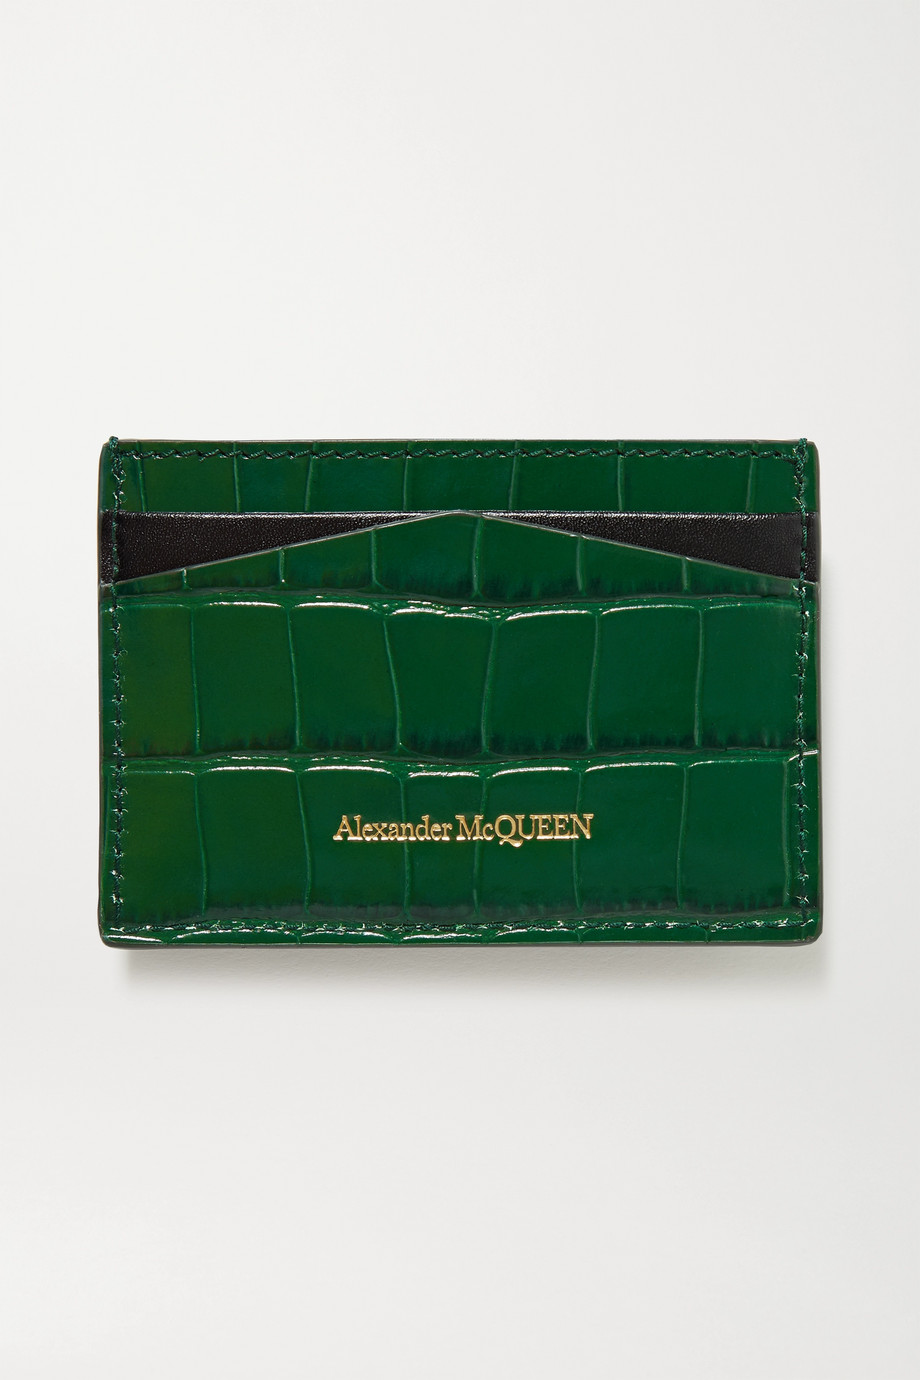 Alexander McQueen Skull croc-effect leather cardholder